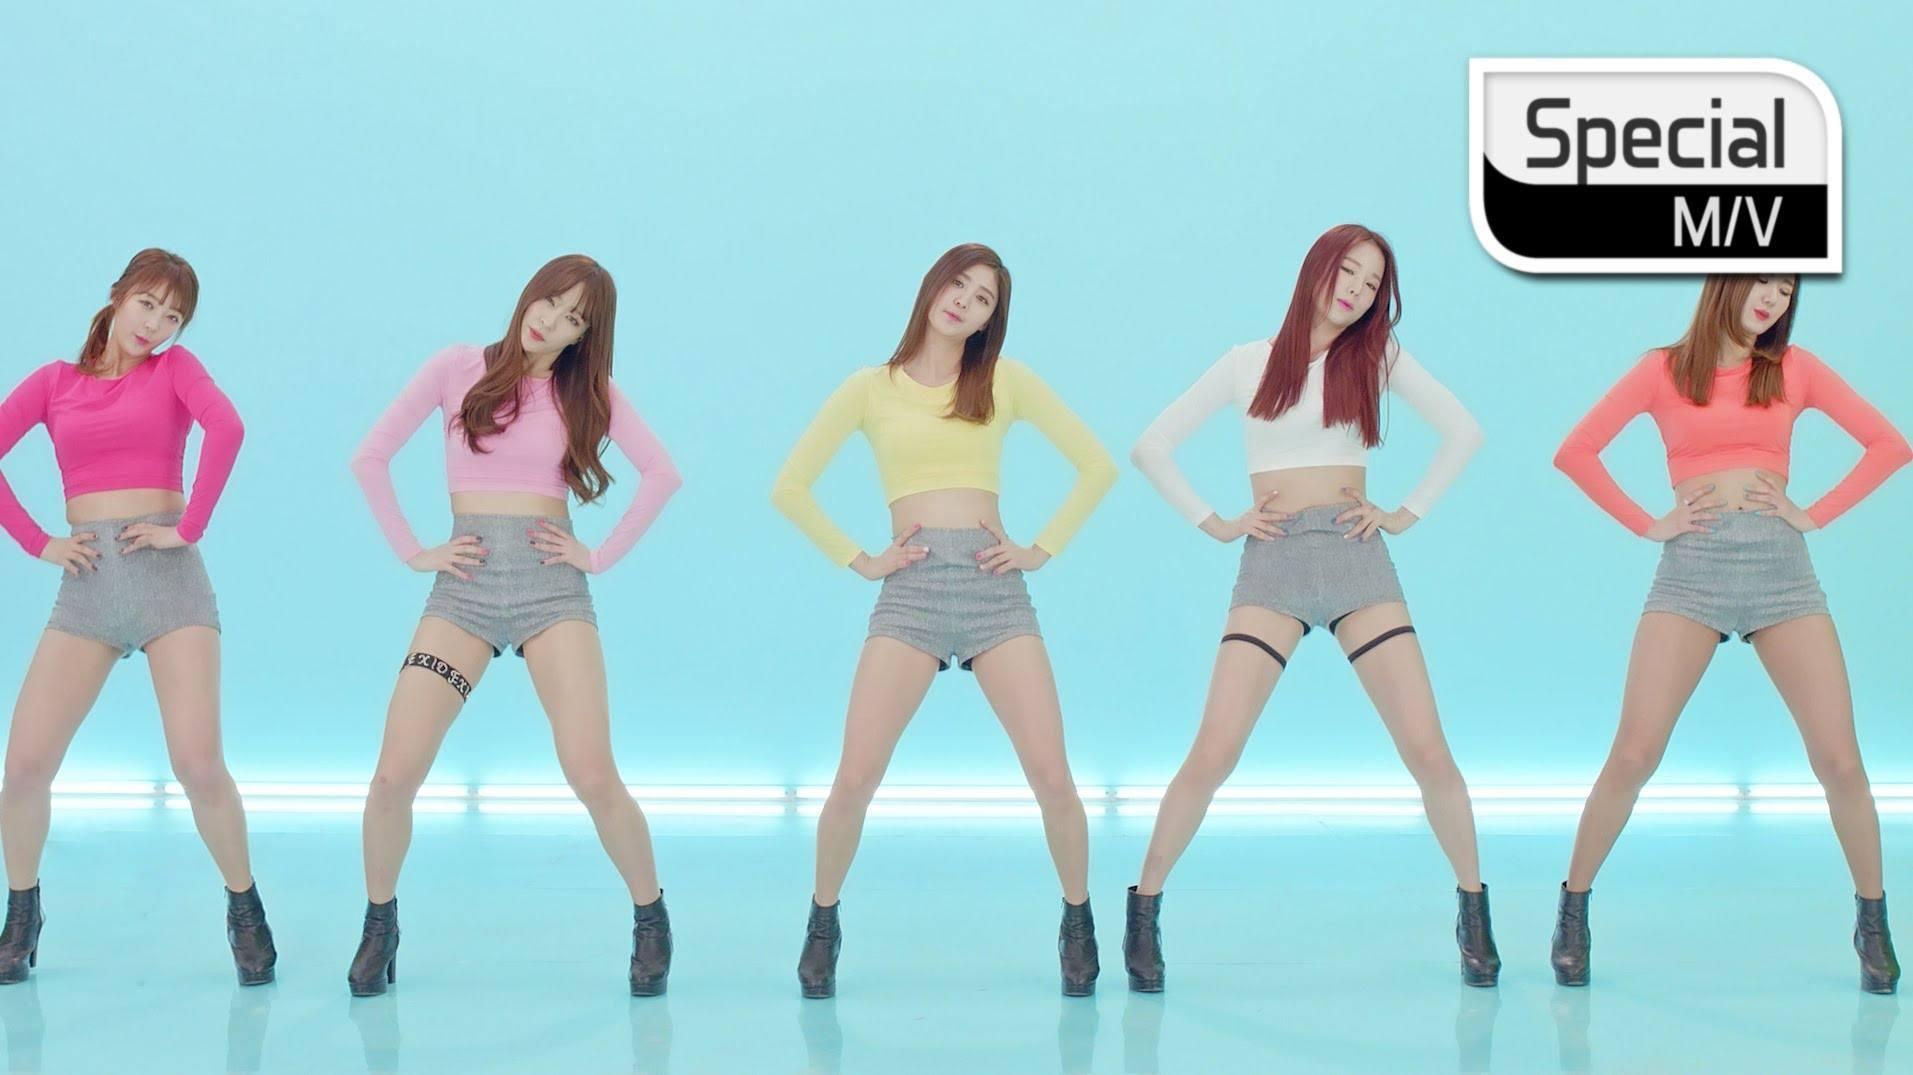 Yedang Entertainment